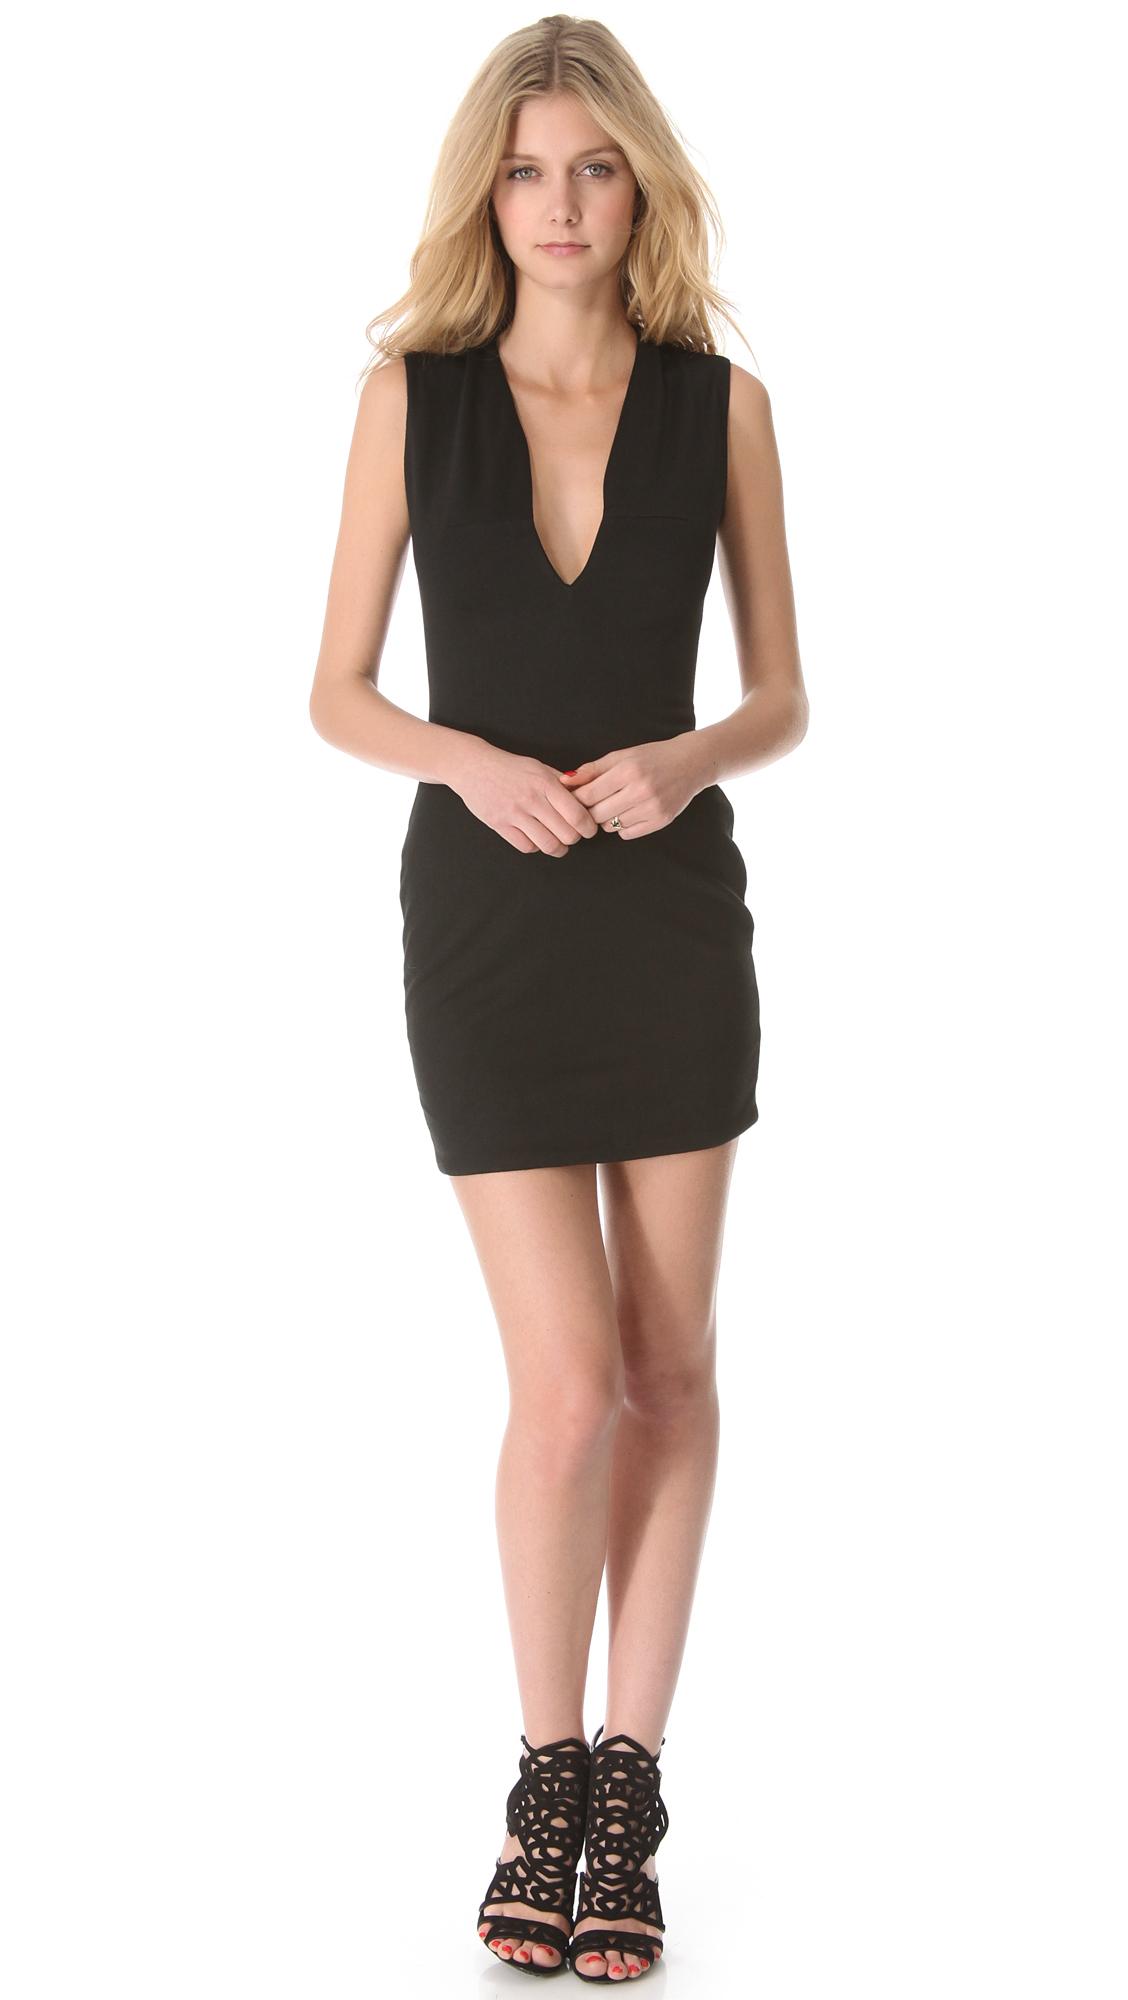 Blaque Label Low Cut Sleeveless Dress In Black Lyst